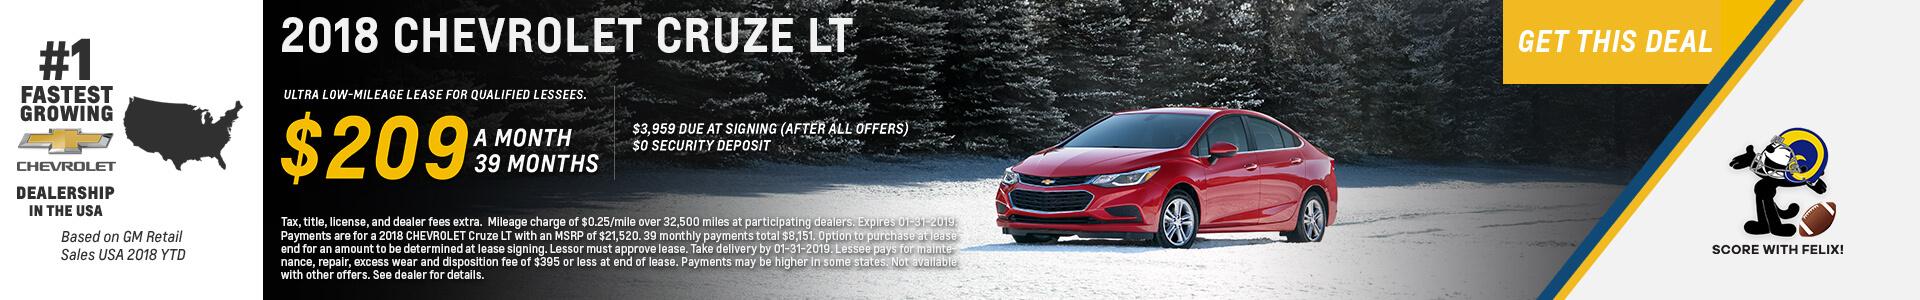 Chevrolet Cruze $209 Lease